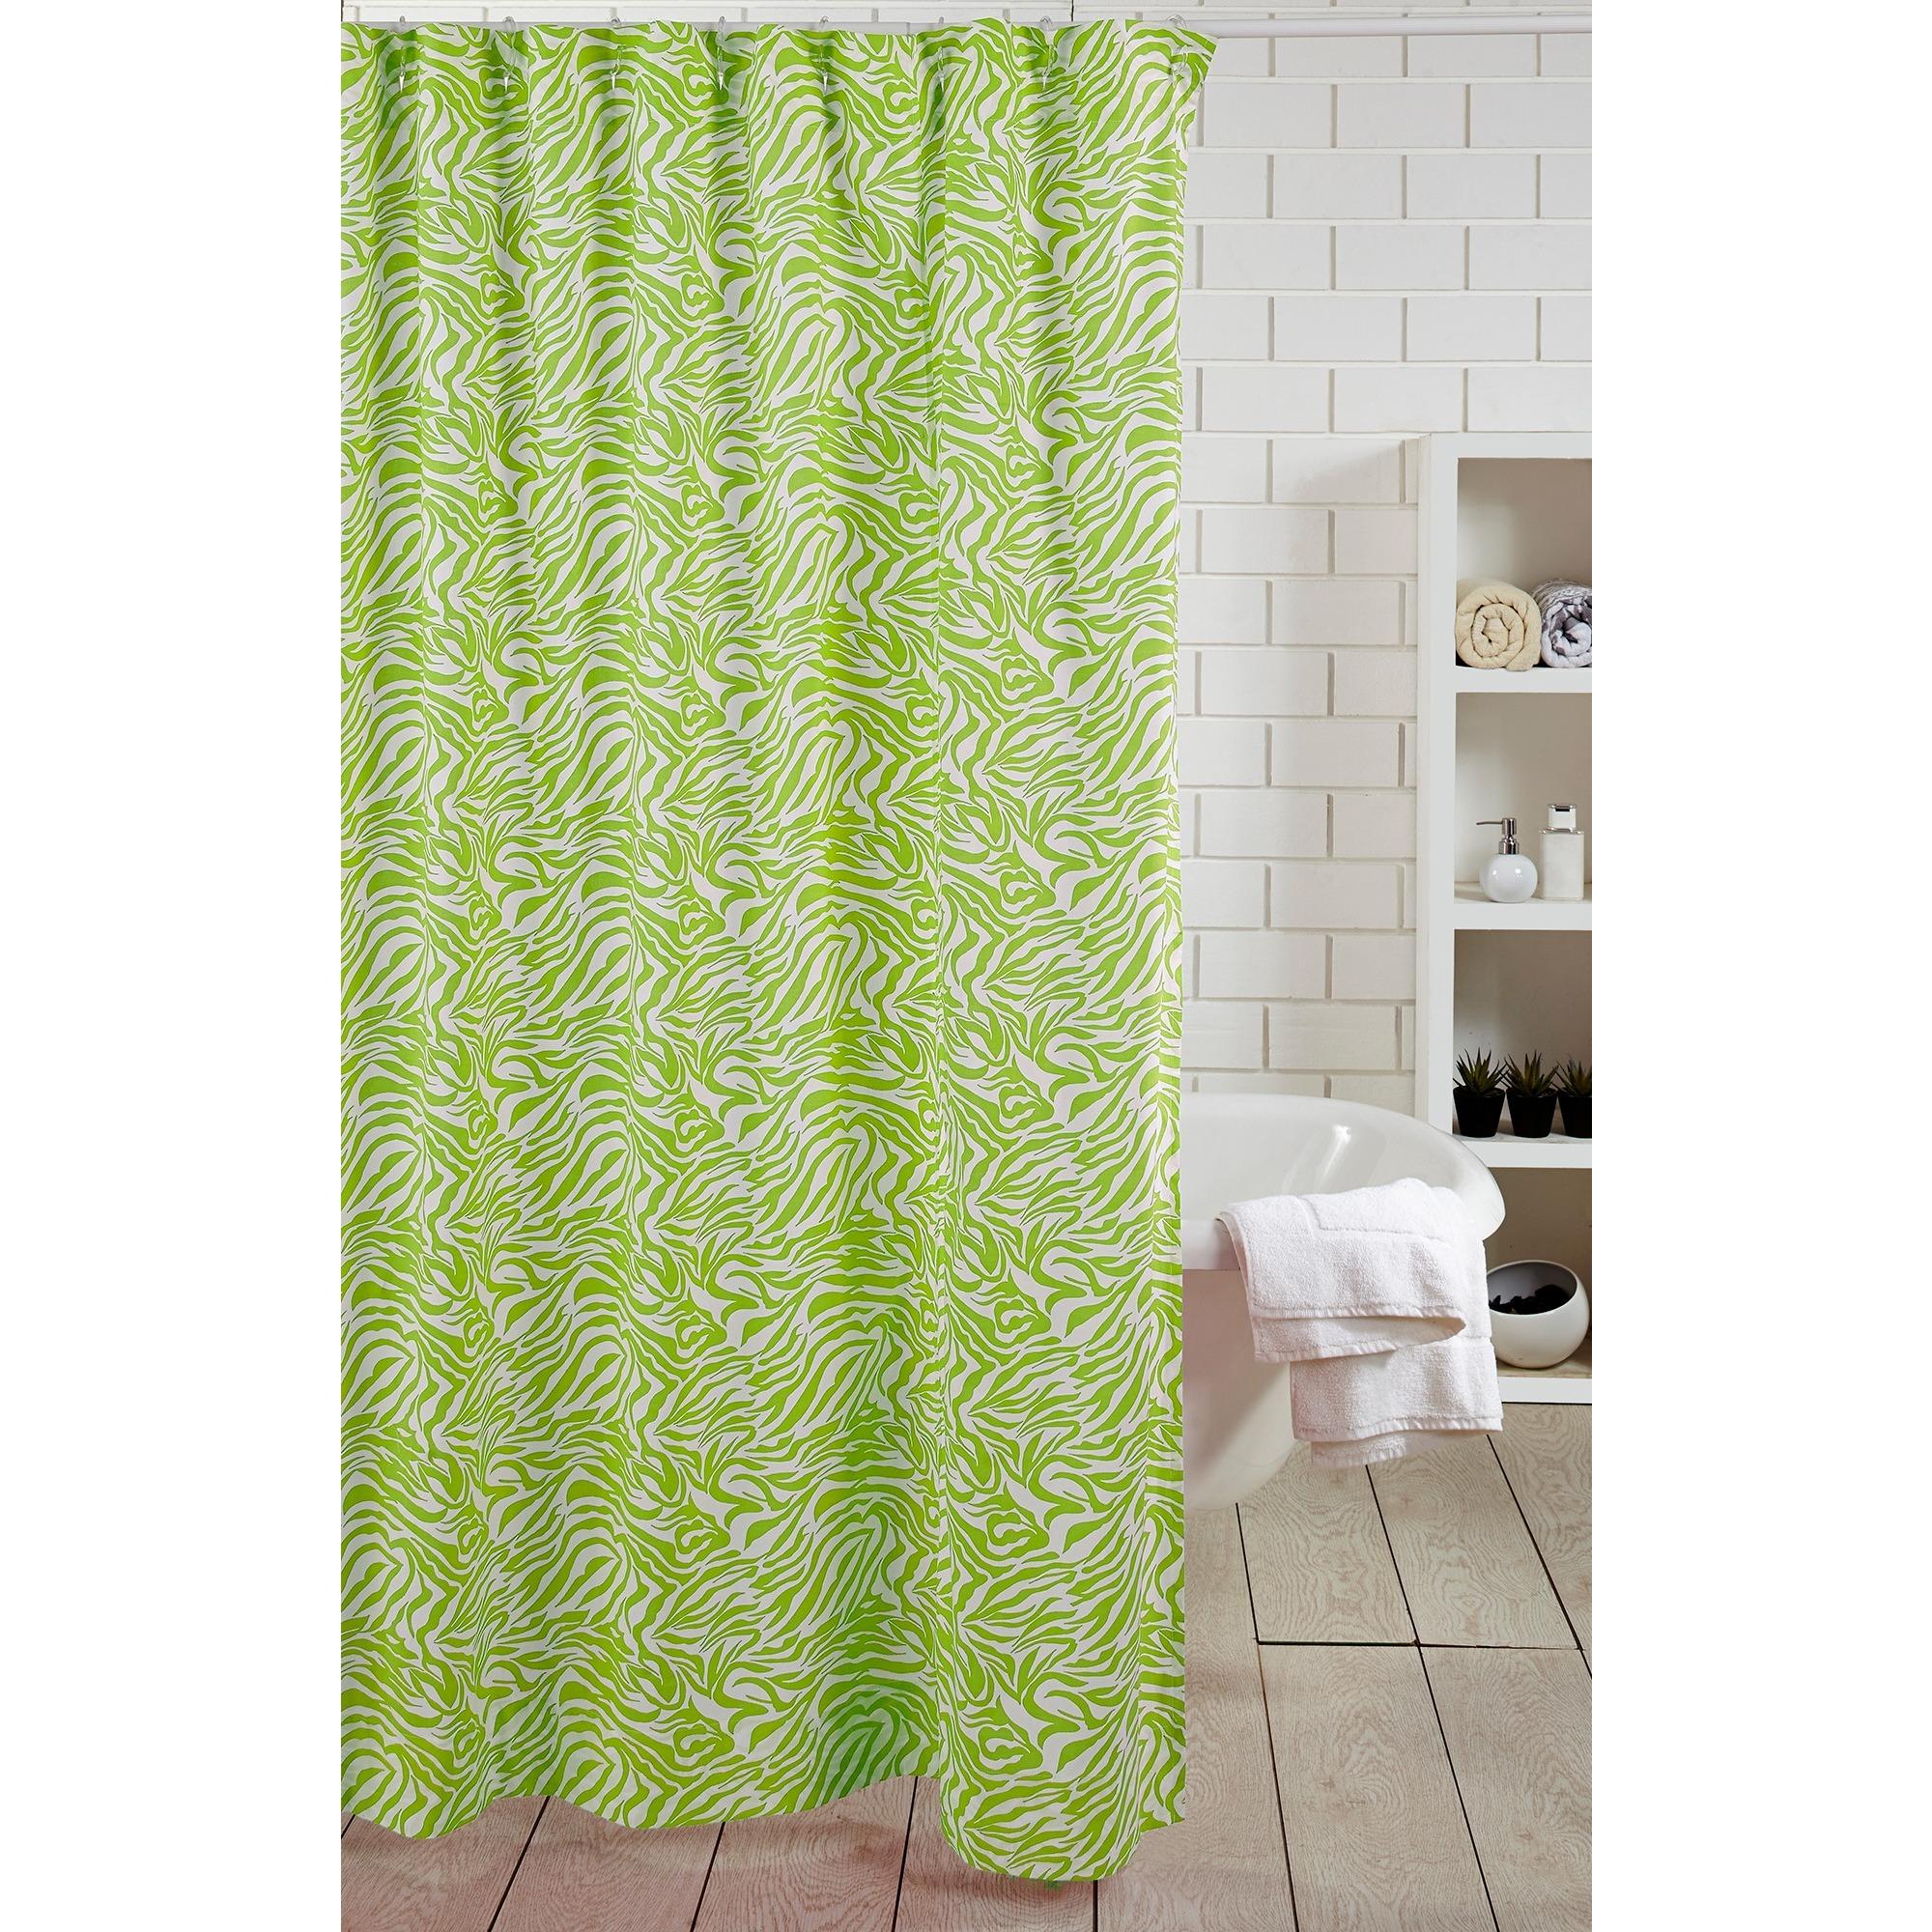 Shop Green Zebra Shower Curtain